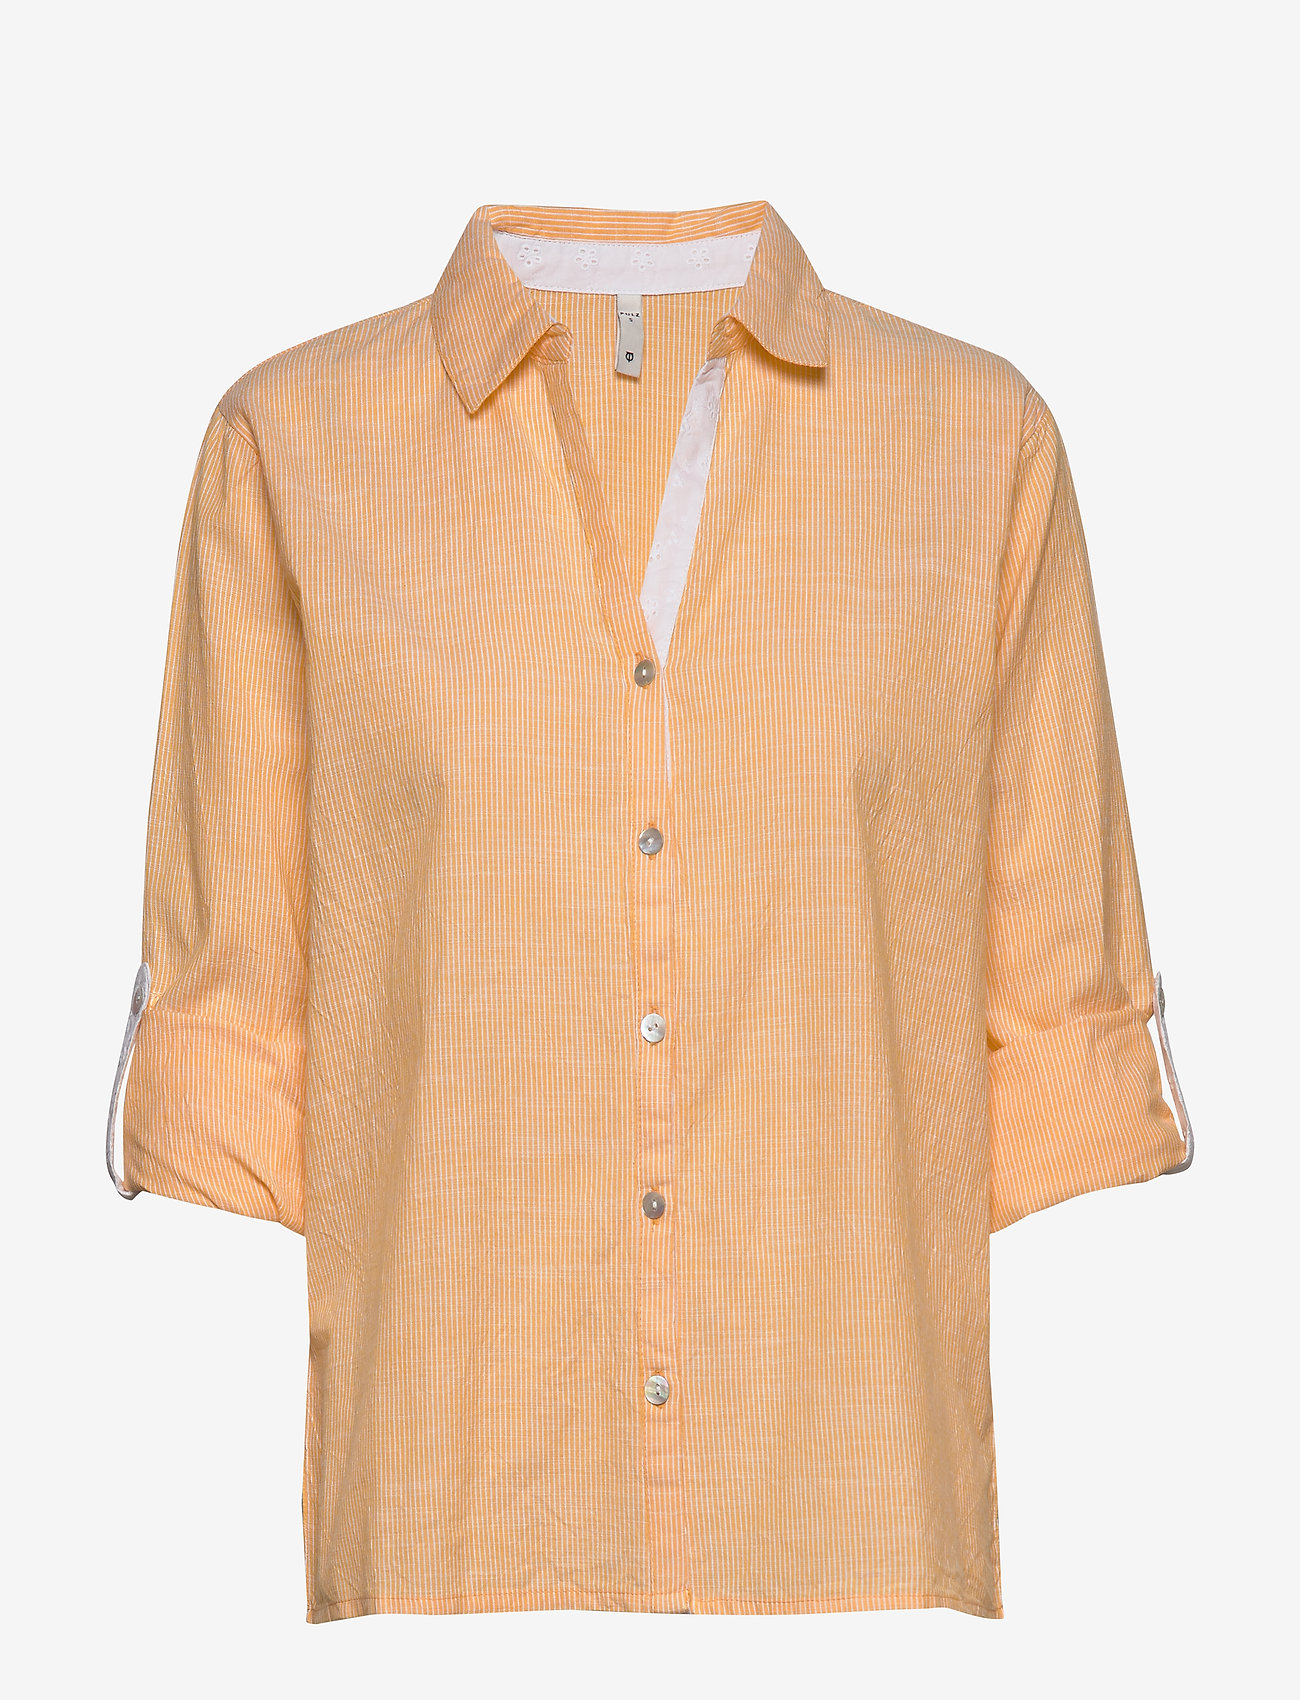 Särskild rabattPzlone Shirt Artisan's Gold 420 Pulz Jeans ghJHh ECvQM